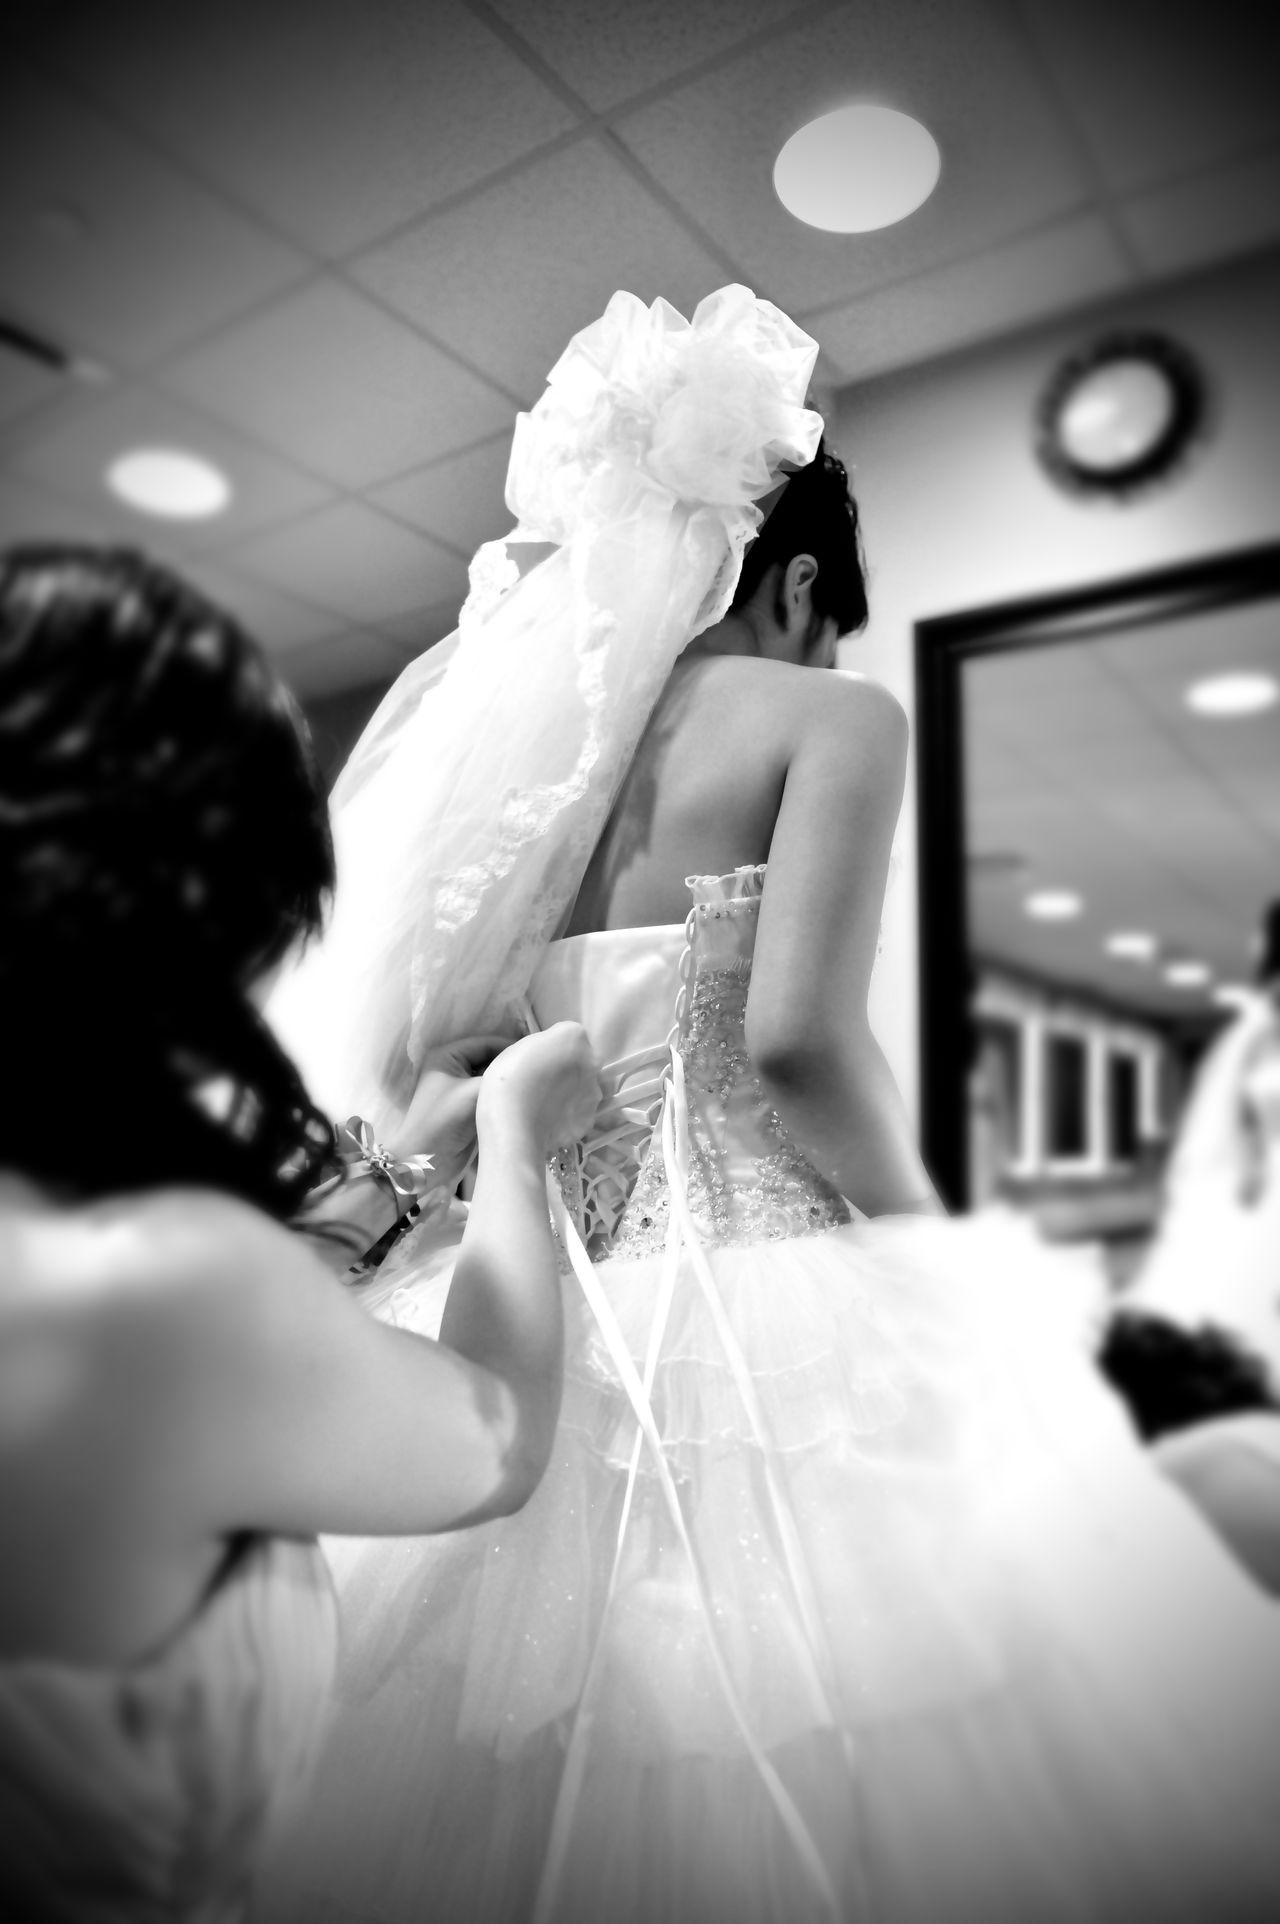 Black & White Wedding Dress Wedding Photography Transitional Moments